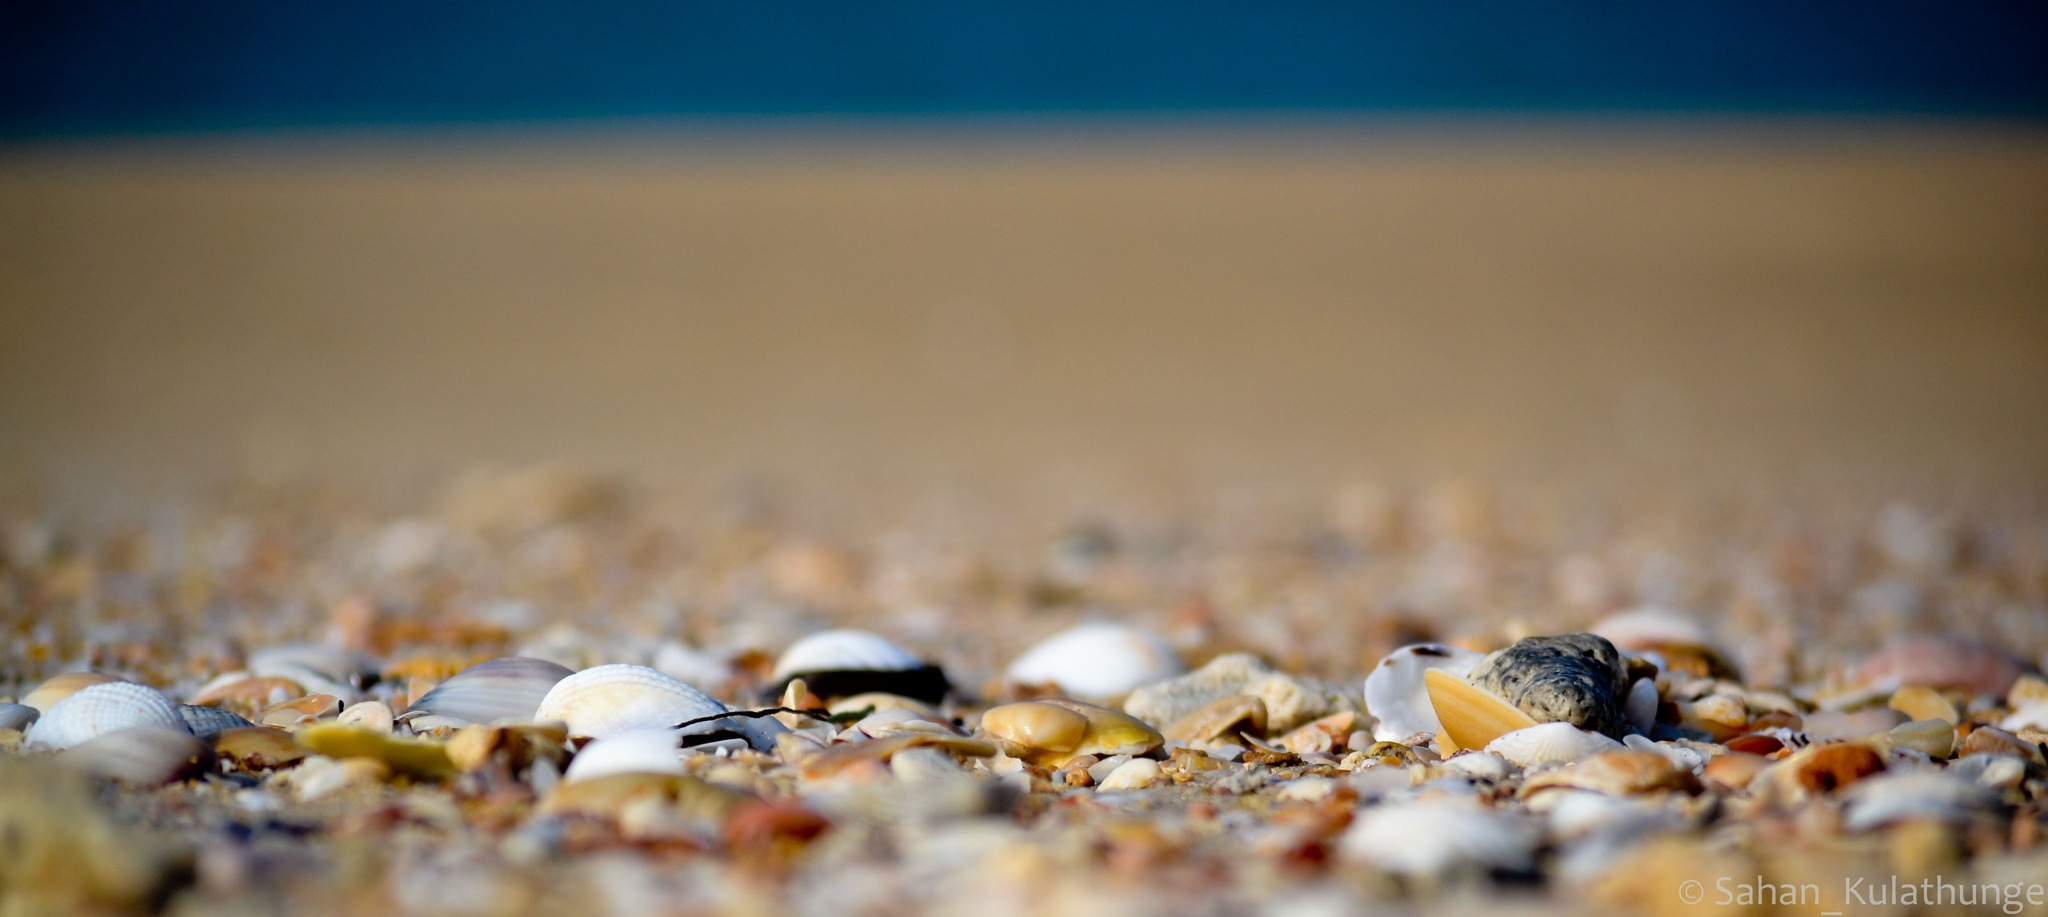 Beach by Sahan Kulathunge